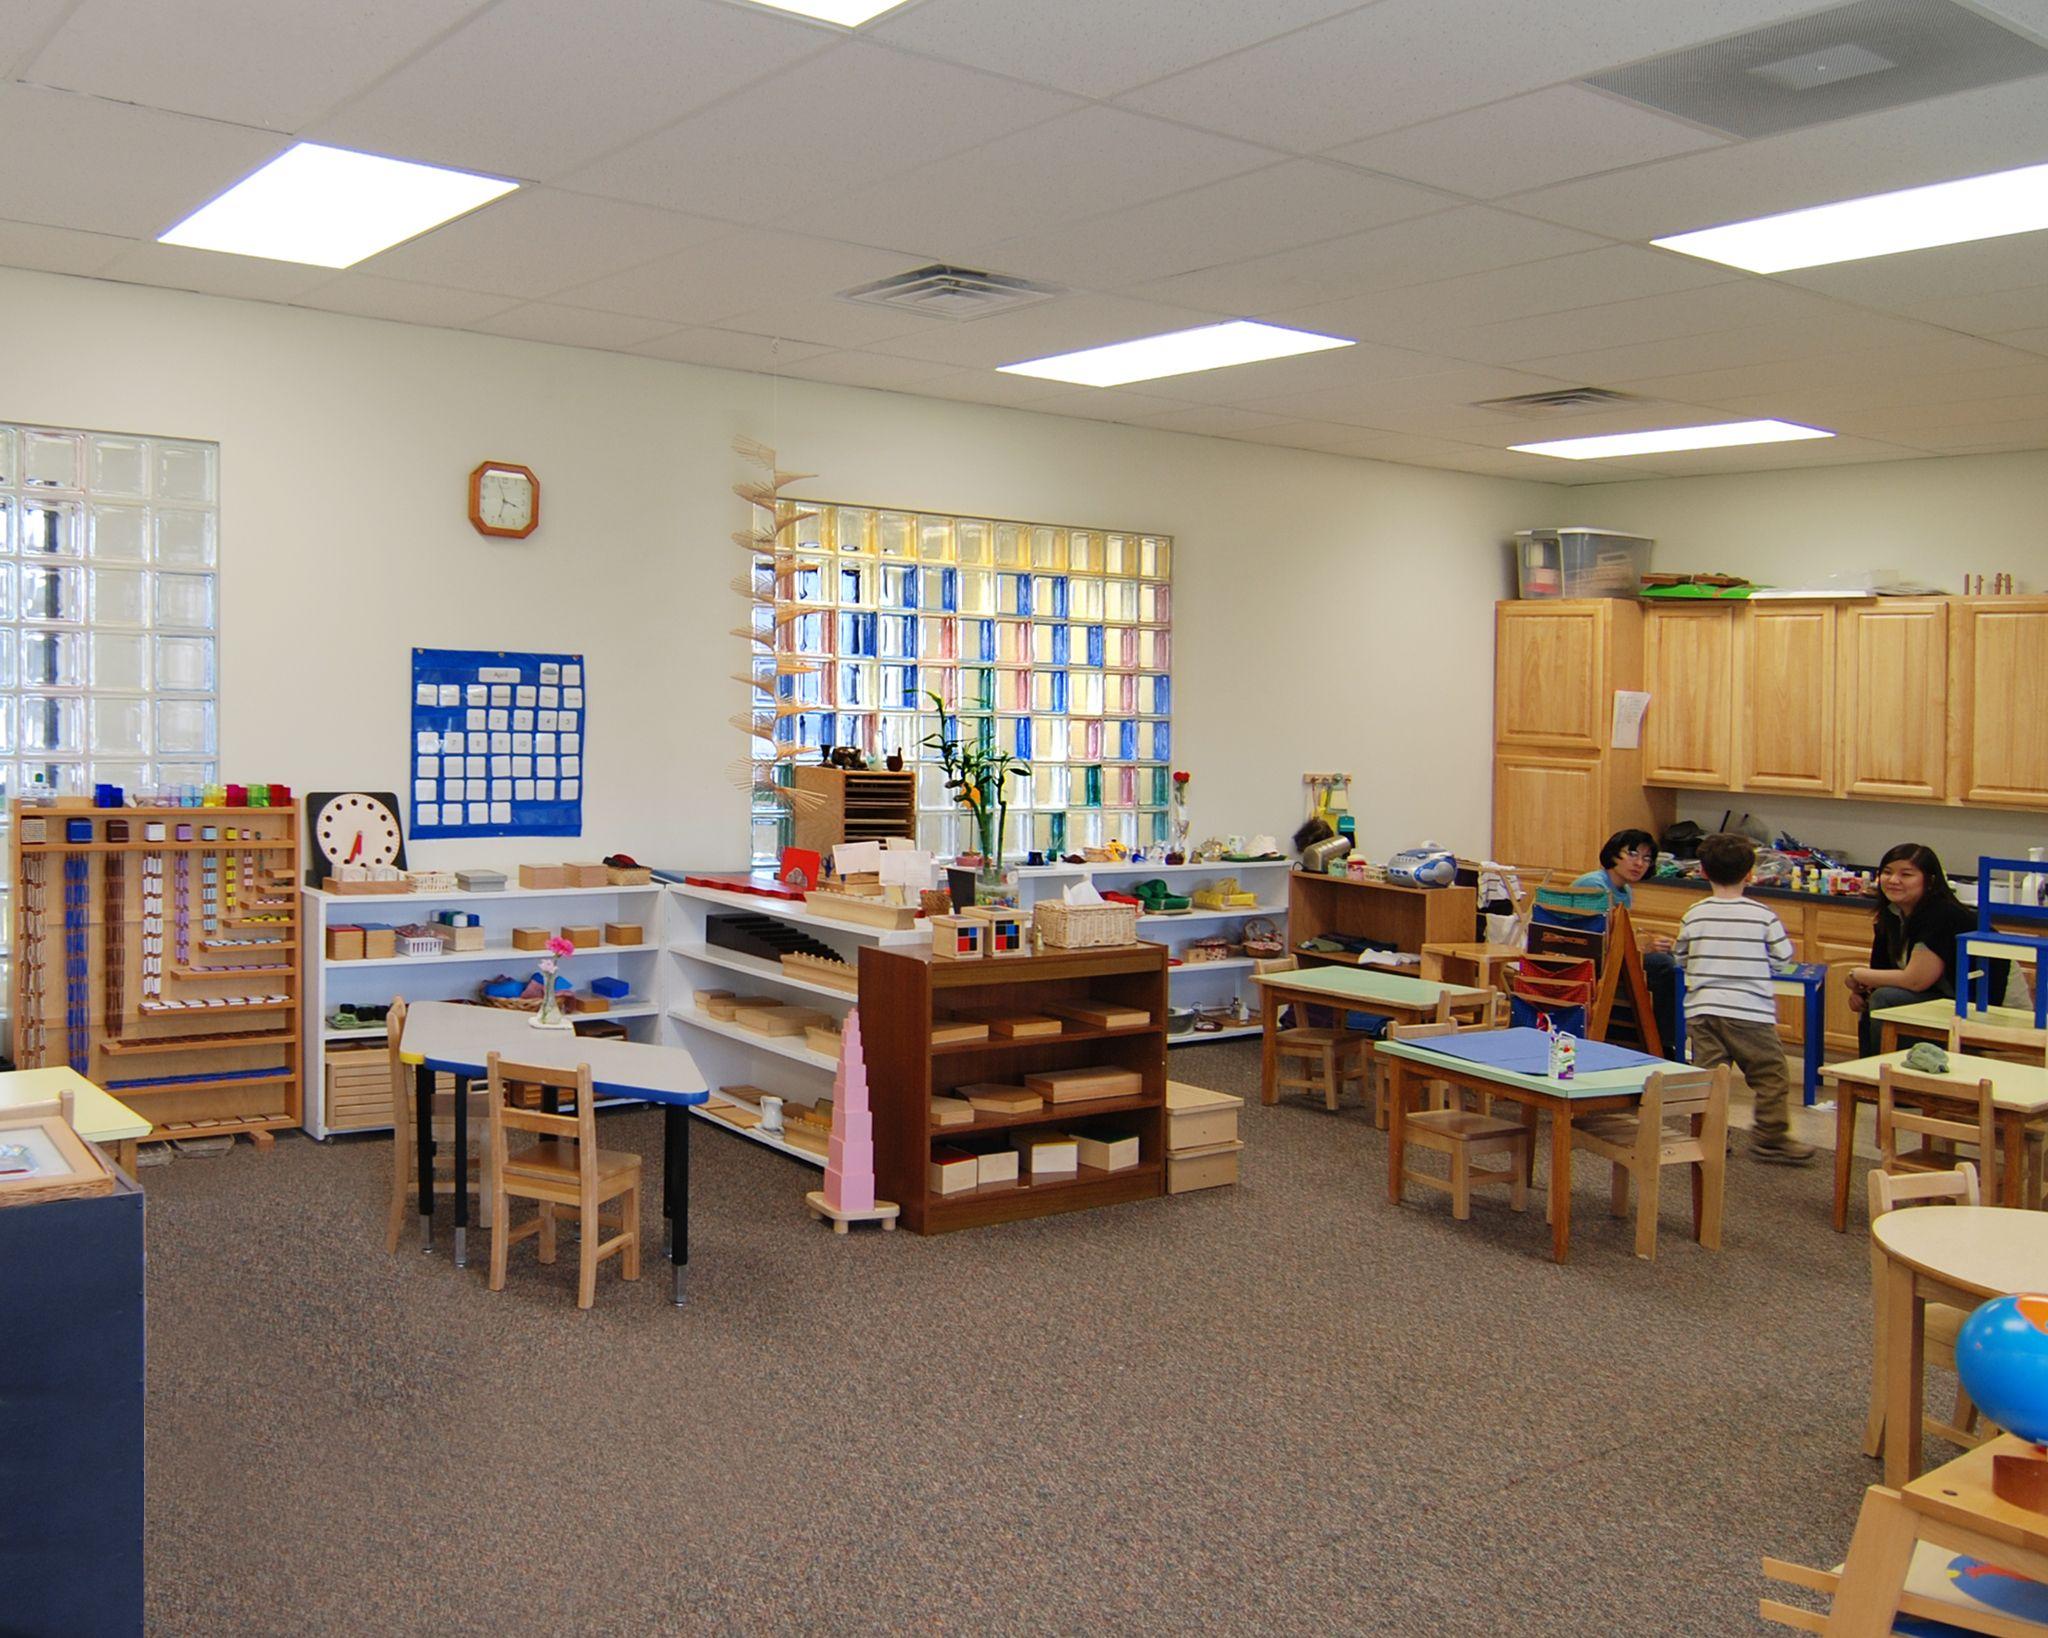 Classroom Design Essay : Montessori classroom layout henson valley montessori school